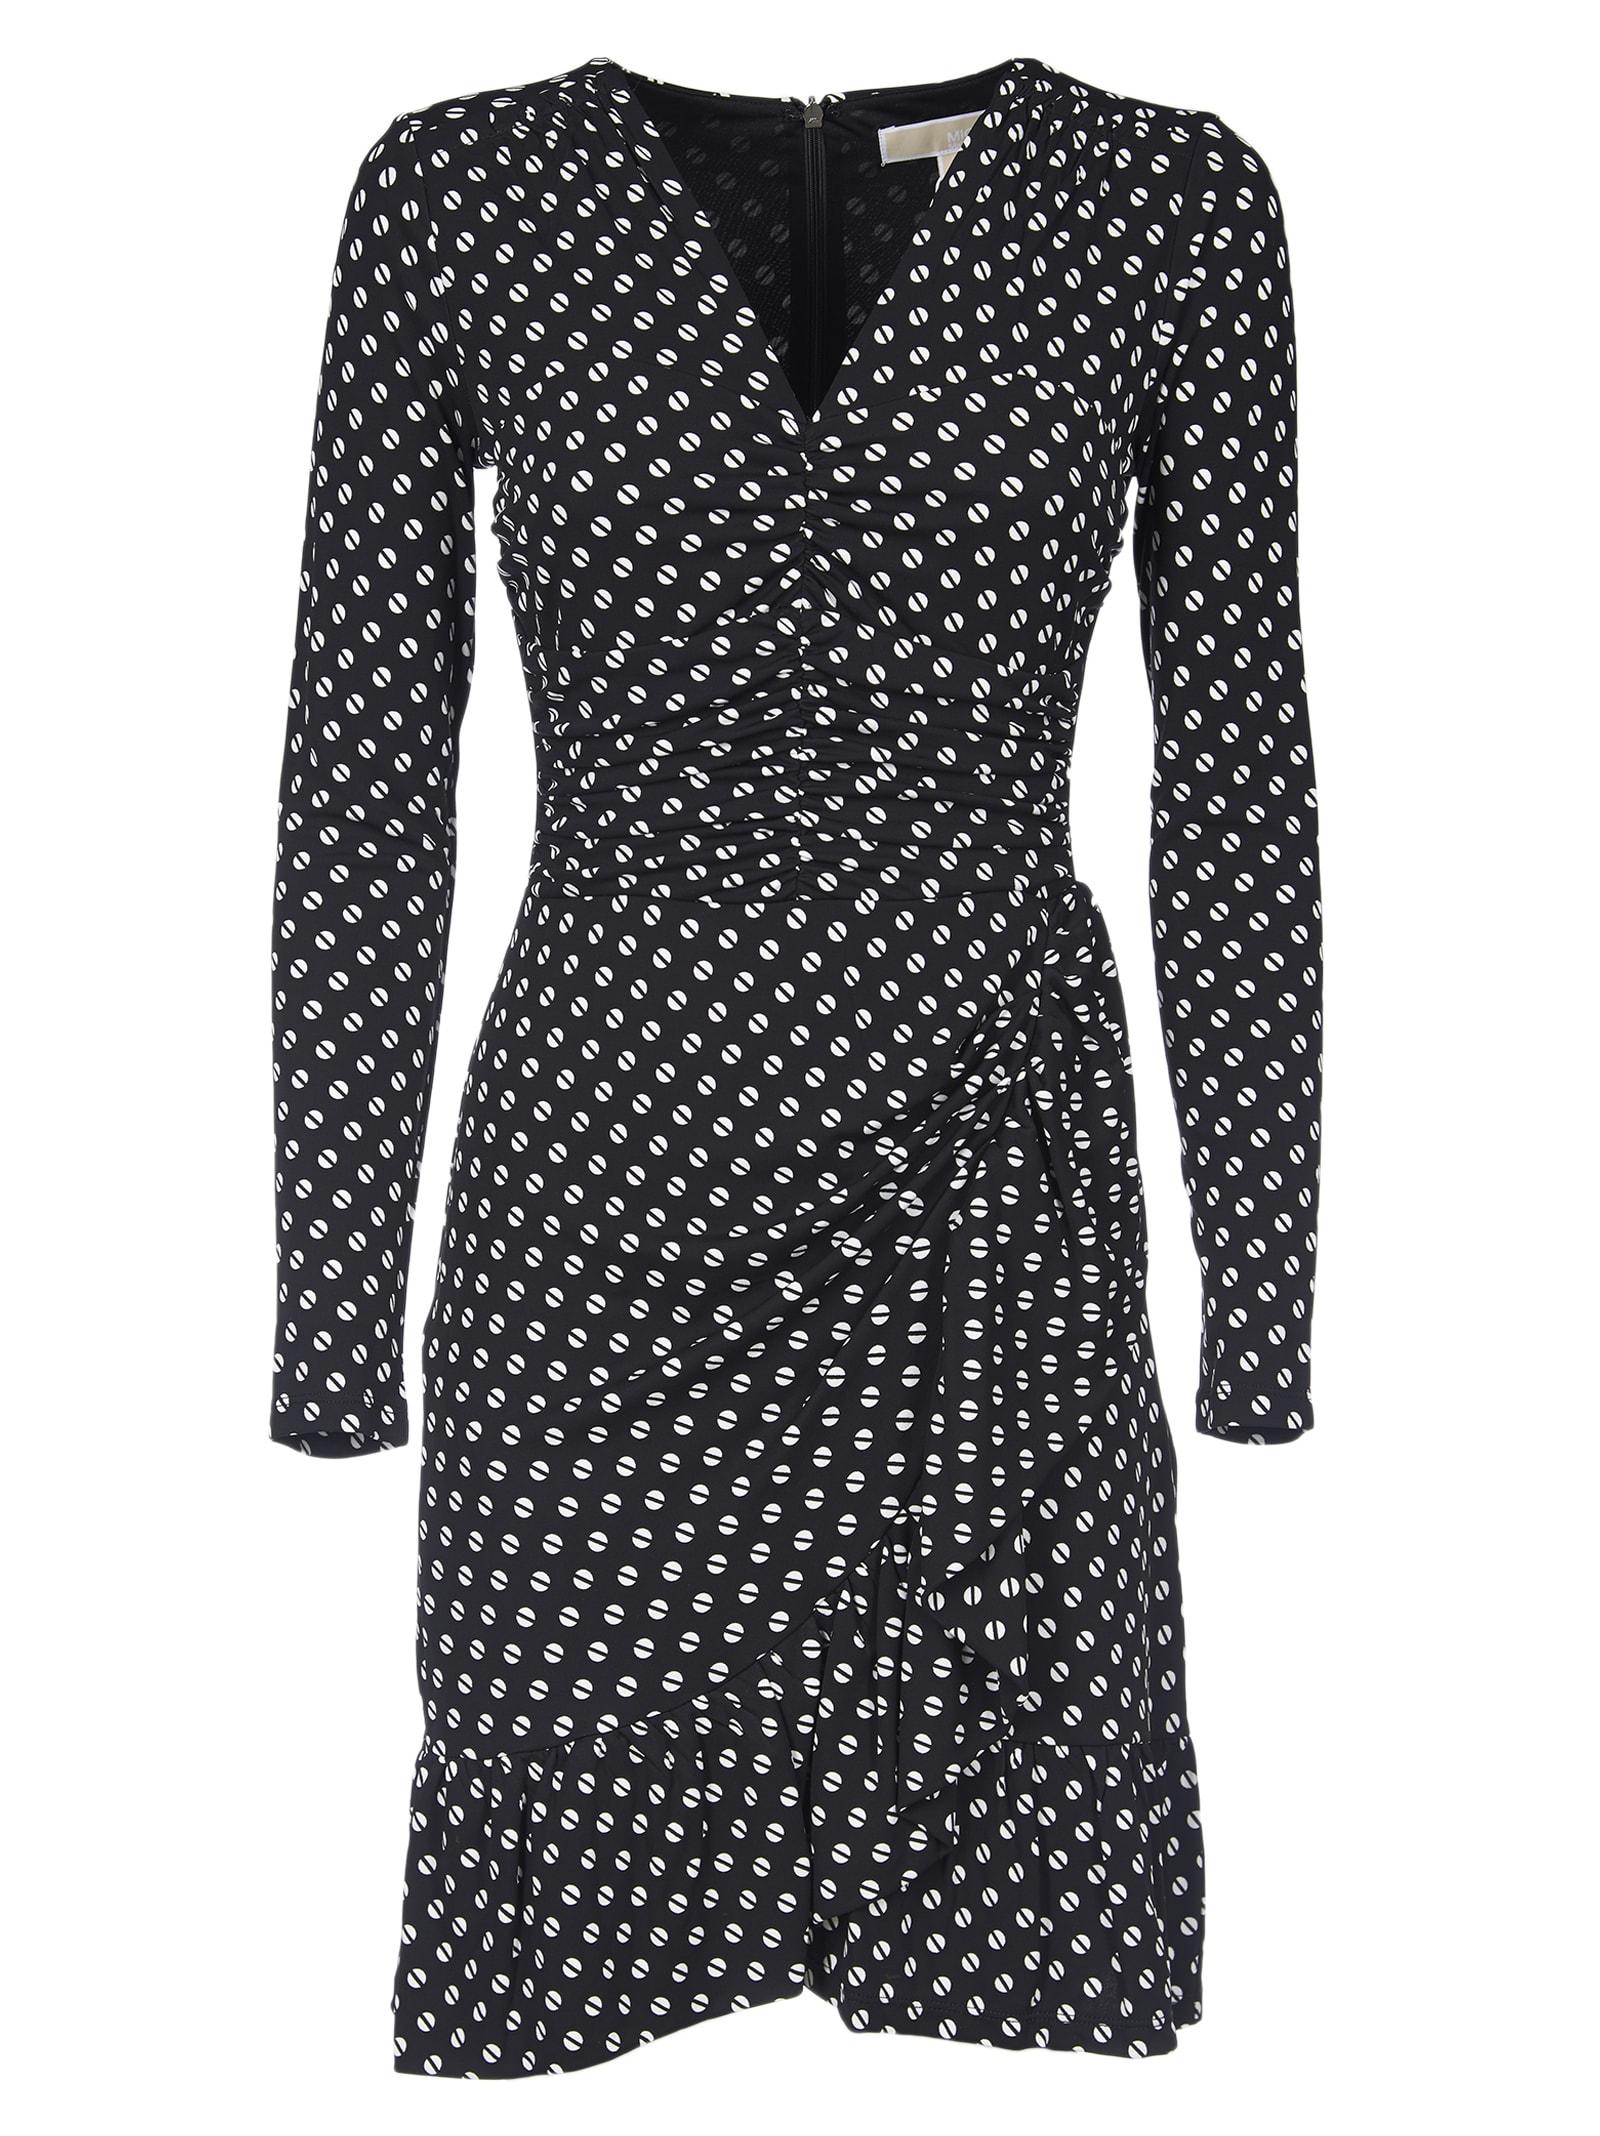 Michael Kors Woman Dress